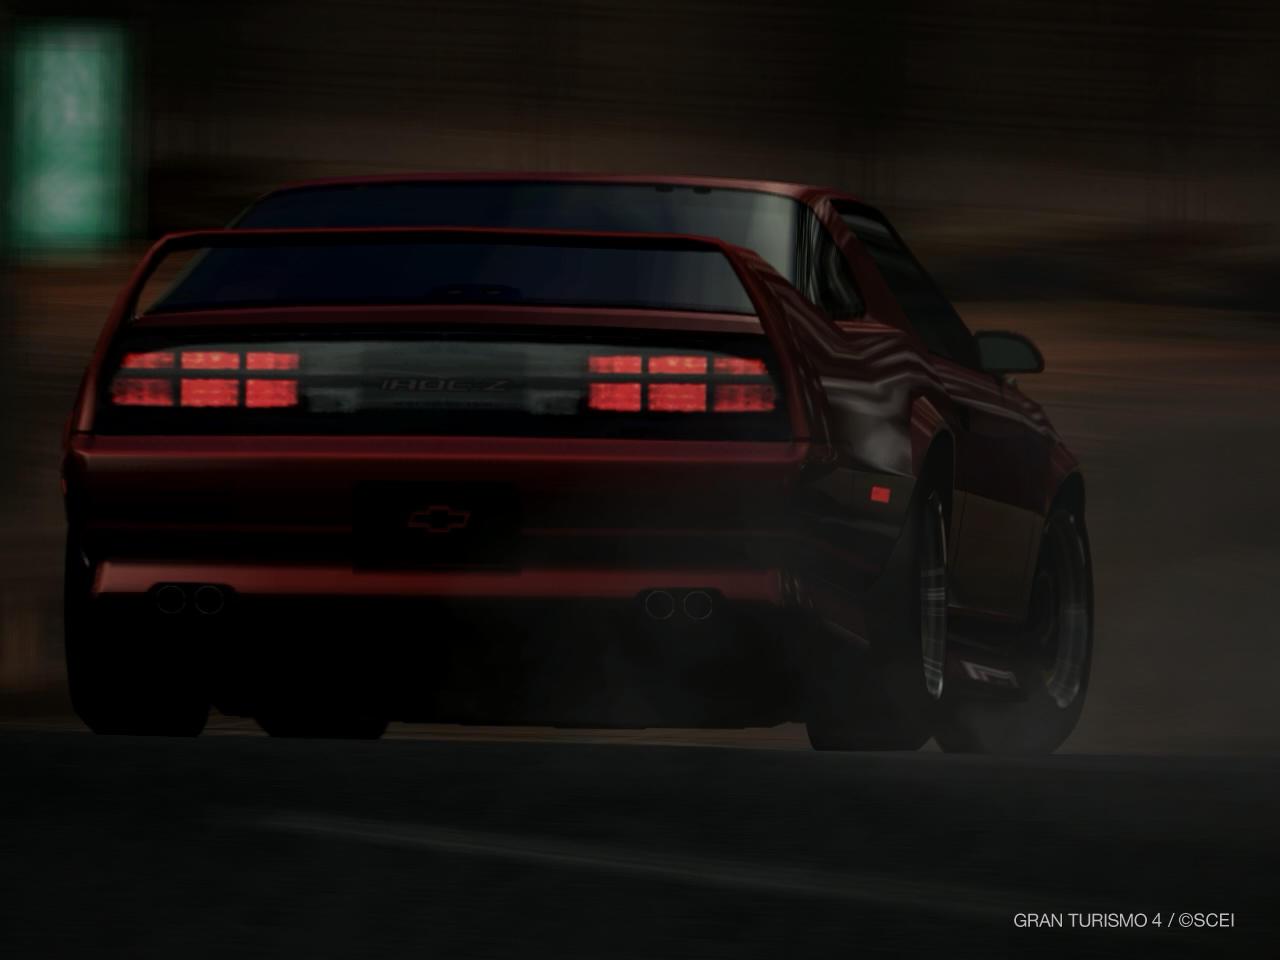 GT4 S.Shot - '88 Iroc-Z Camaro